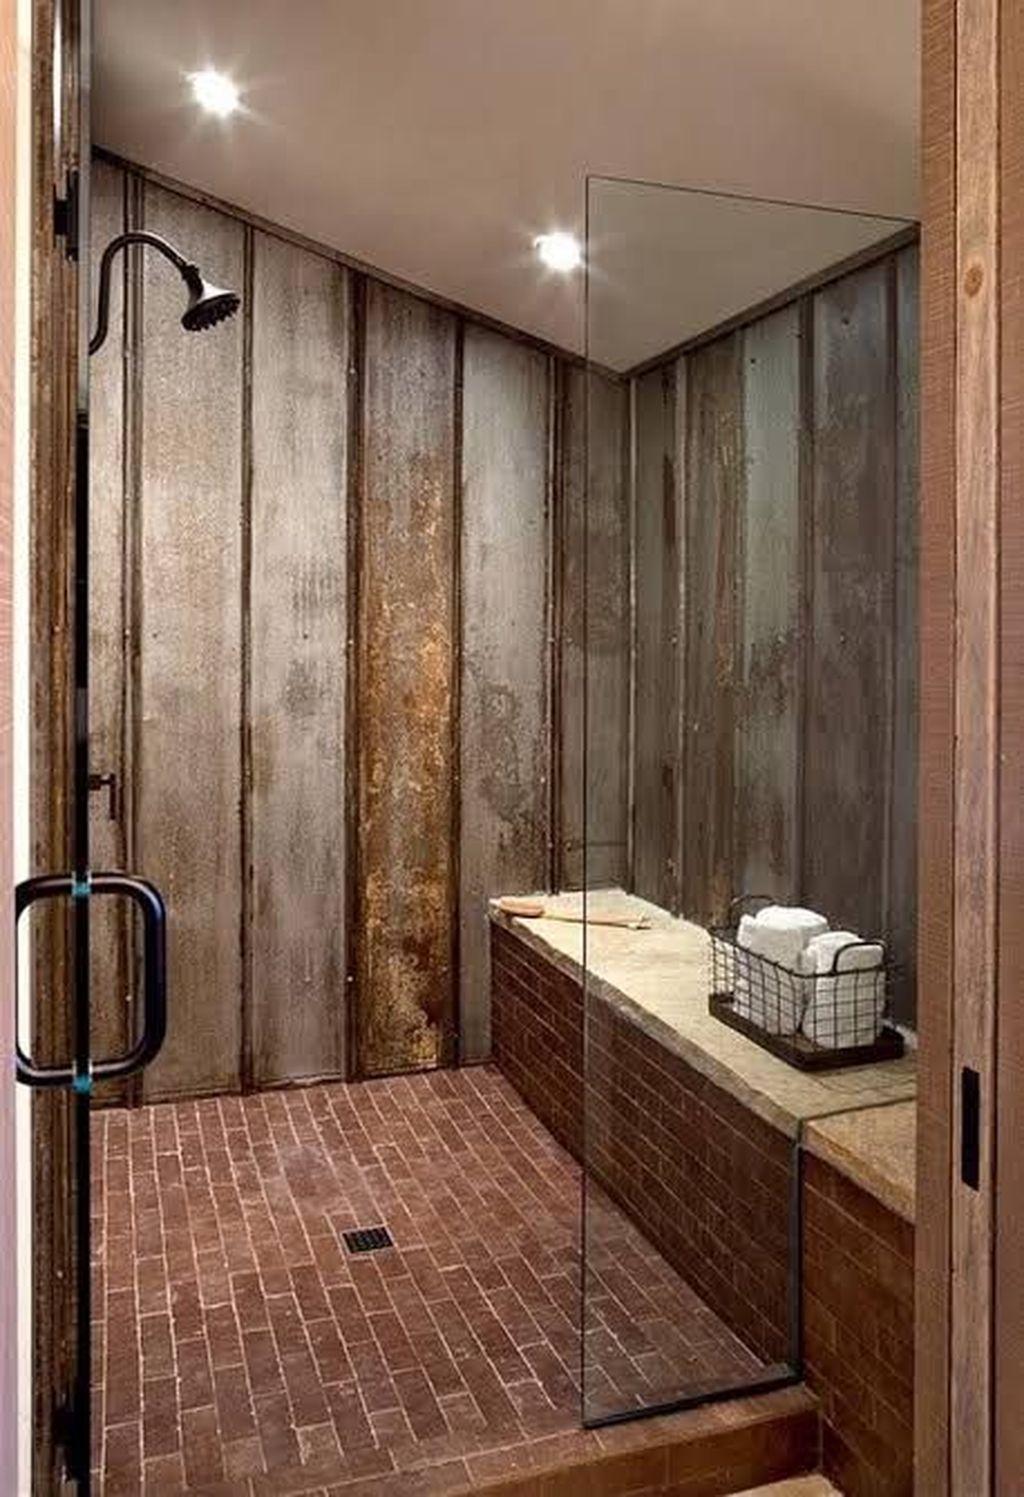 Marvelous Wooden Shower Floor Tiles Designs Ideas For Bathroom Remodel 35